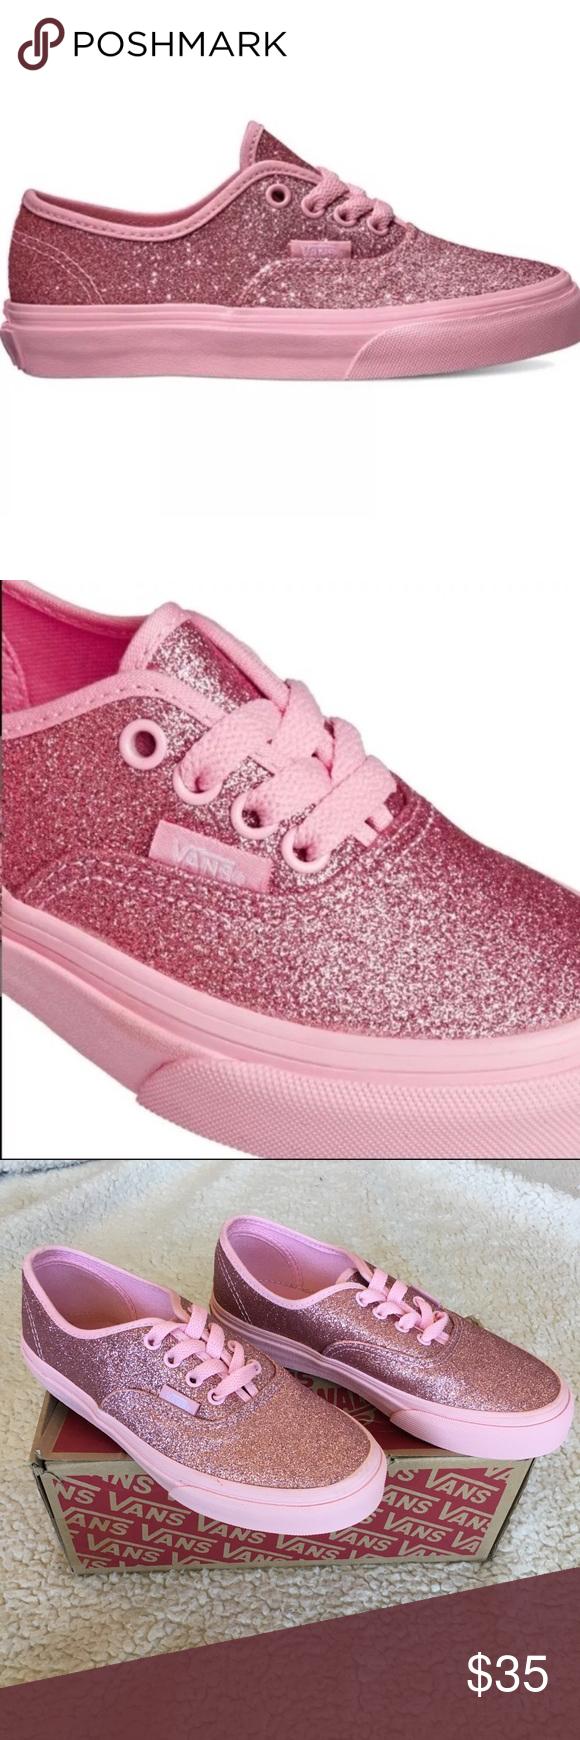 NIB Girls 2.5 Vans Authentic Glitter NIB Girls 2.5 Vans Authentic 2e2492101